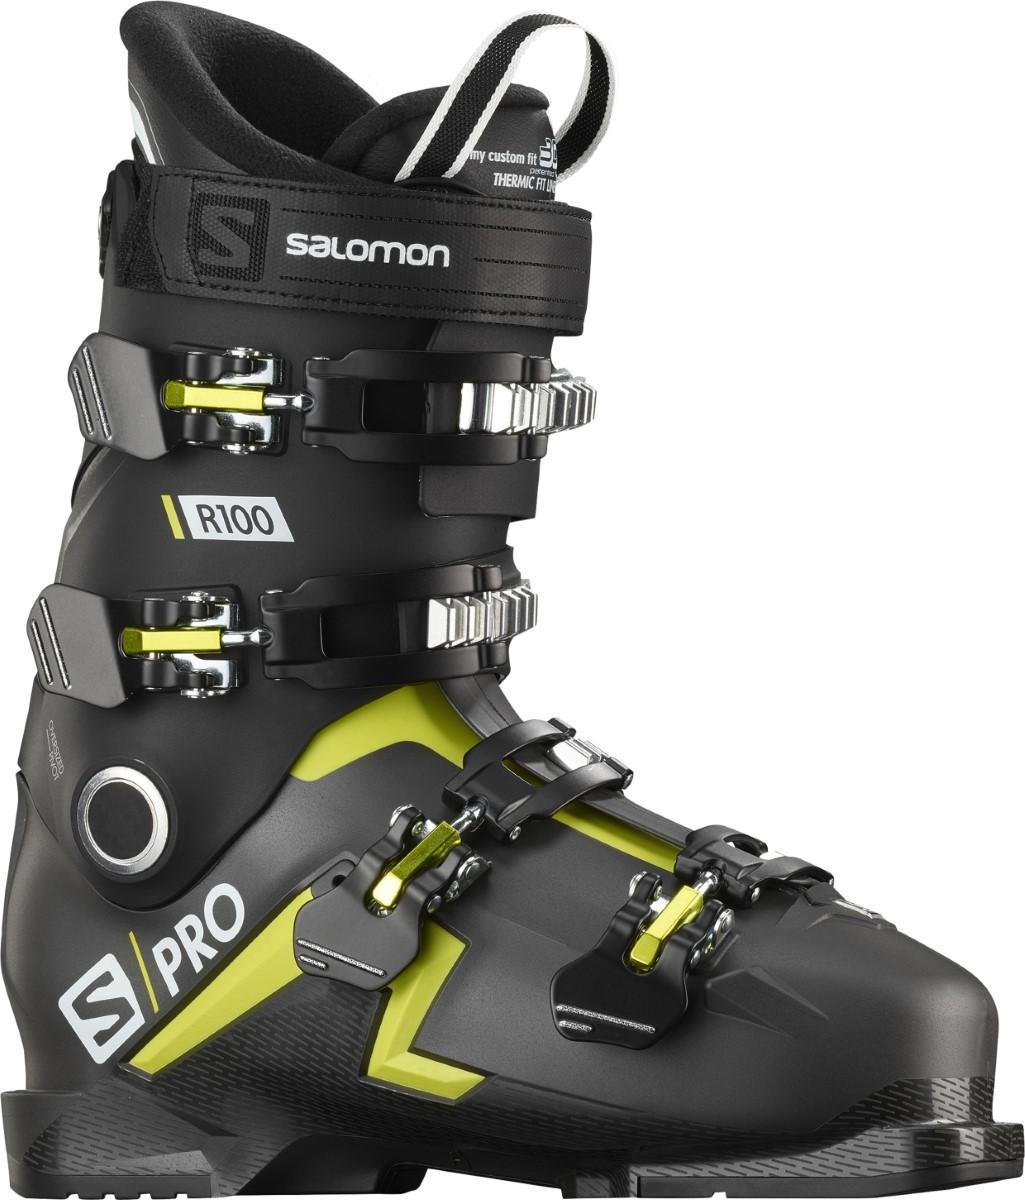 Salomon S/PRO R100